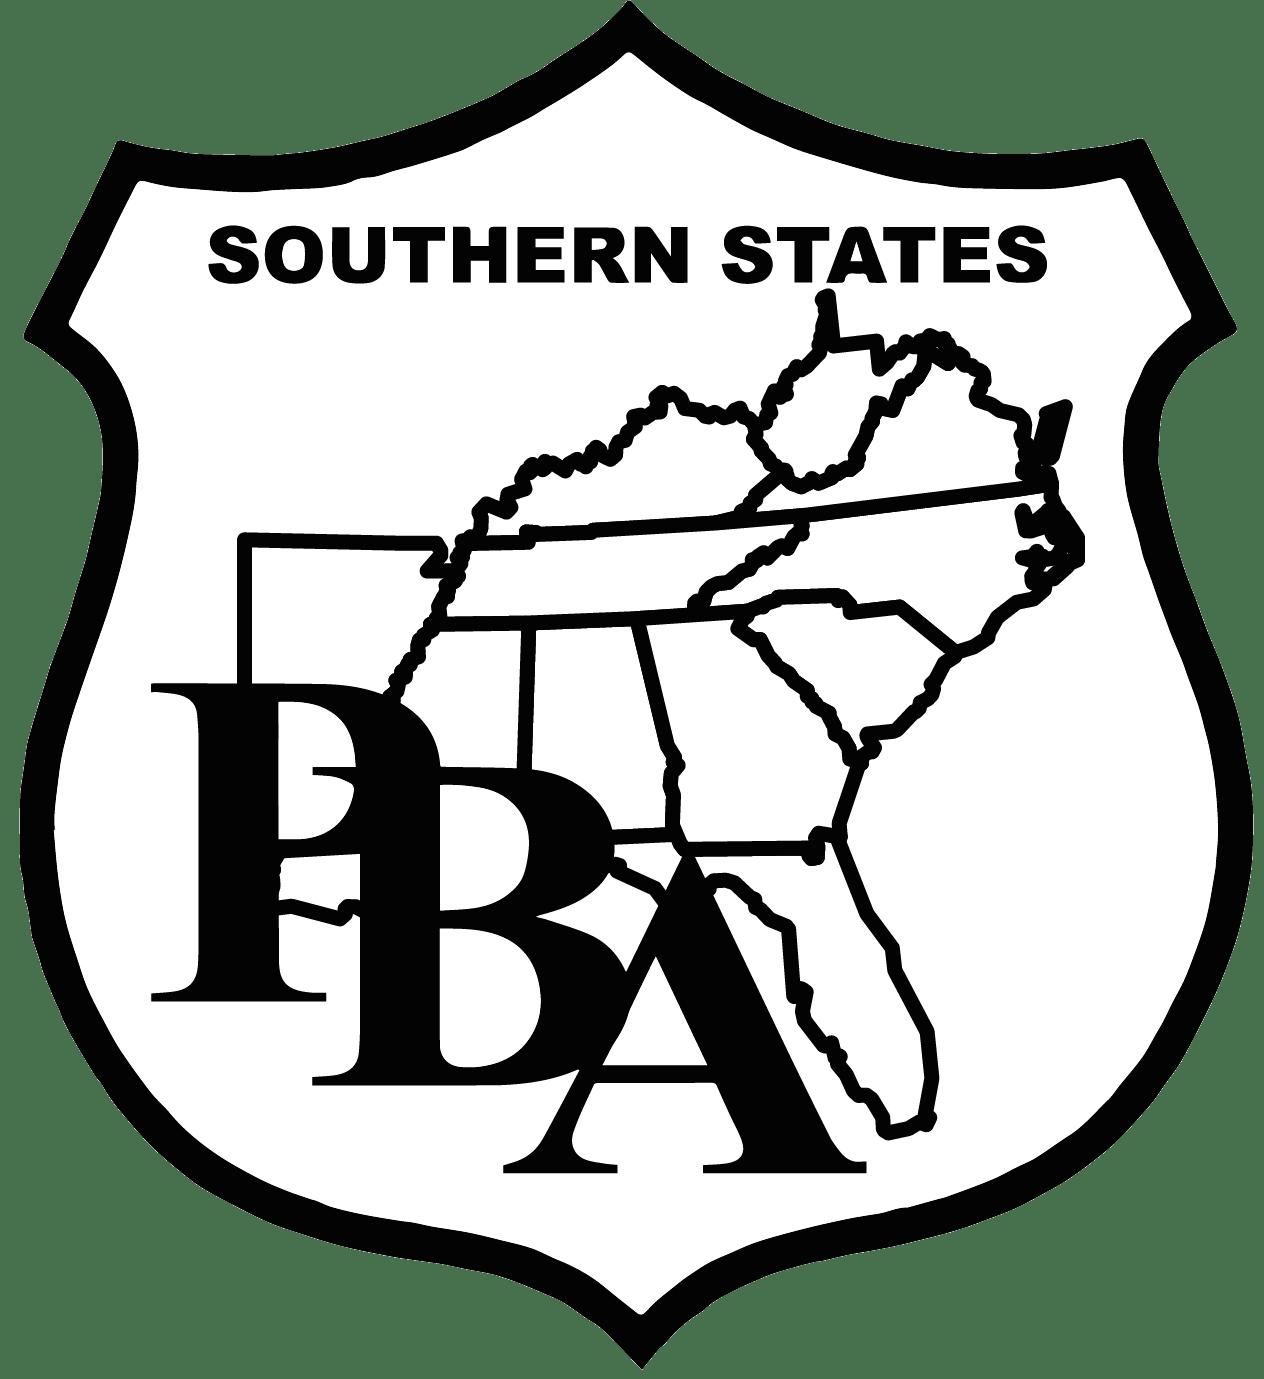 Southern States PBA expresses concern regarding departure